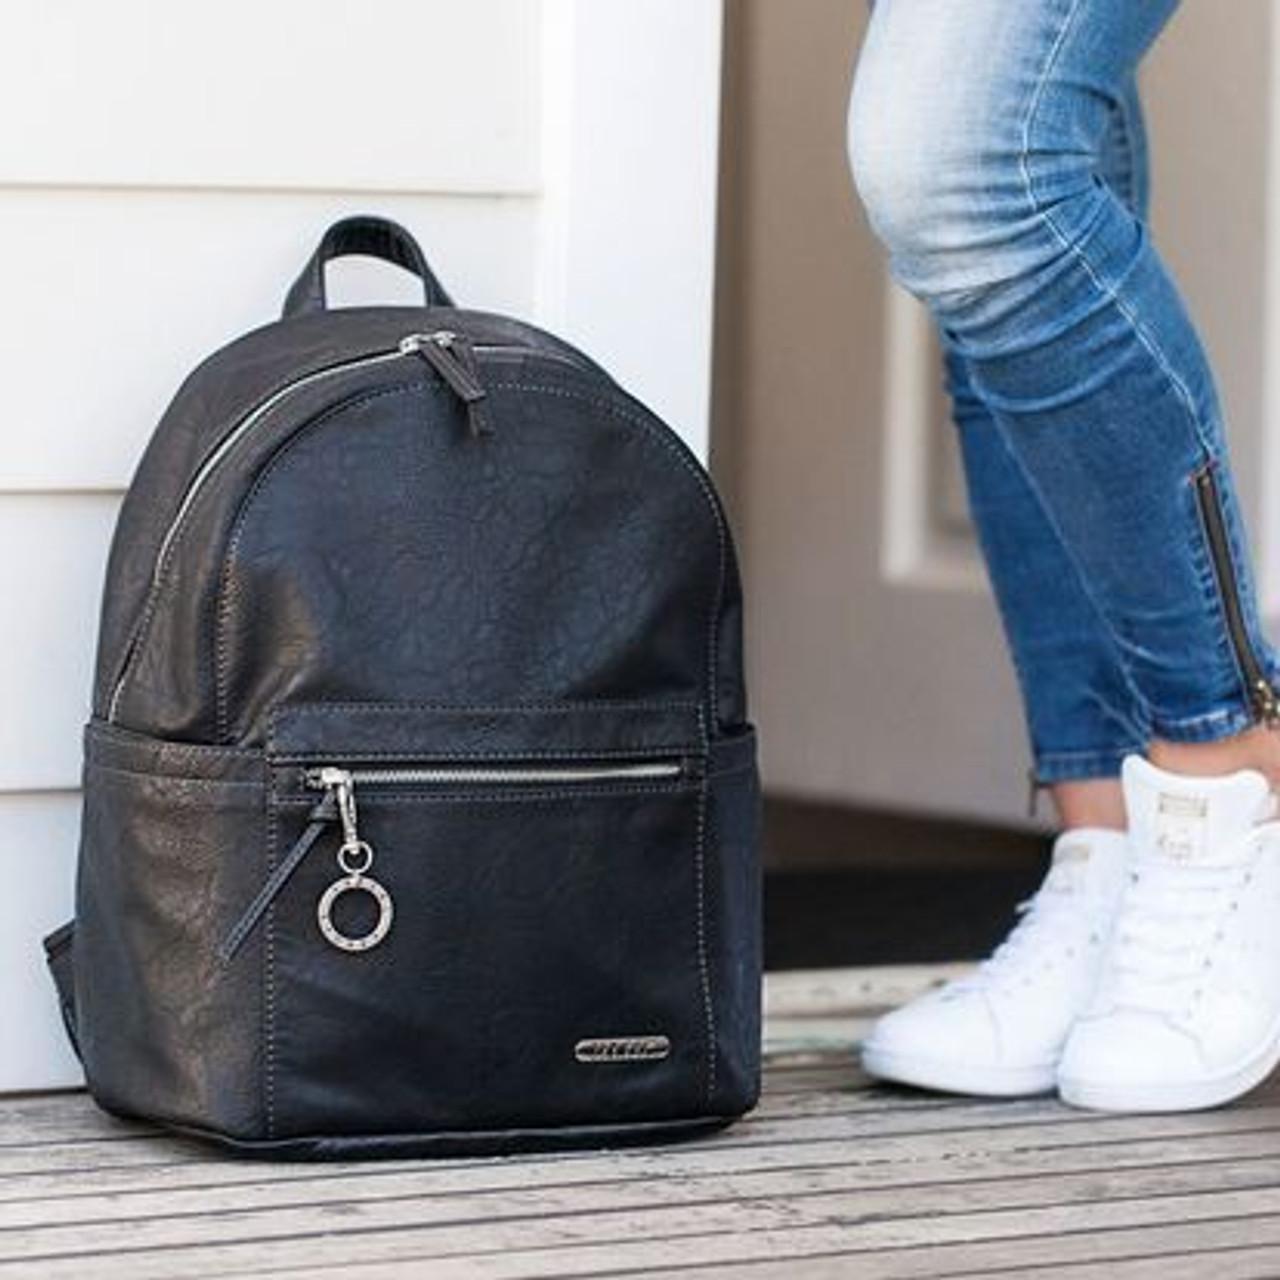 Vanchi Manhattan Backpack Nappy Bag Black at Baby Barn Discounts